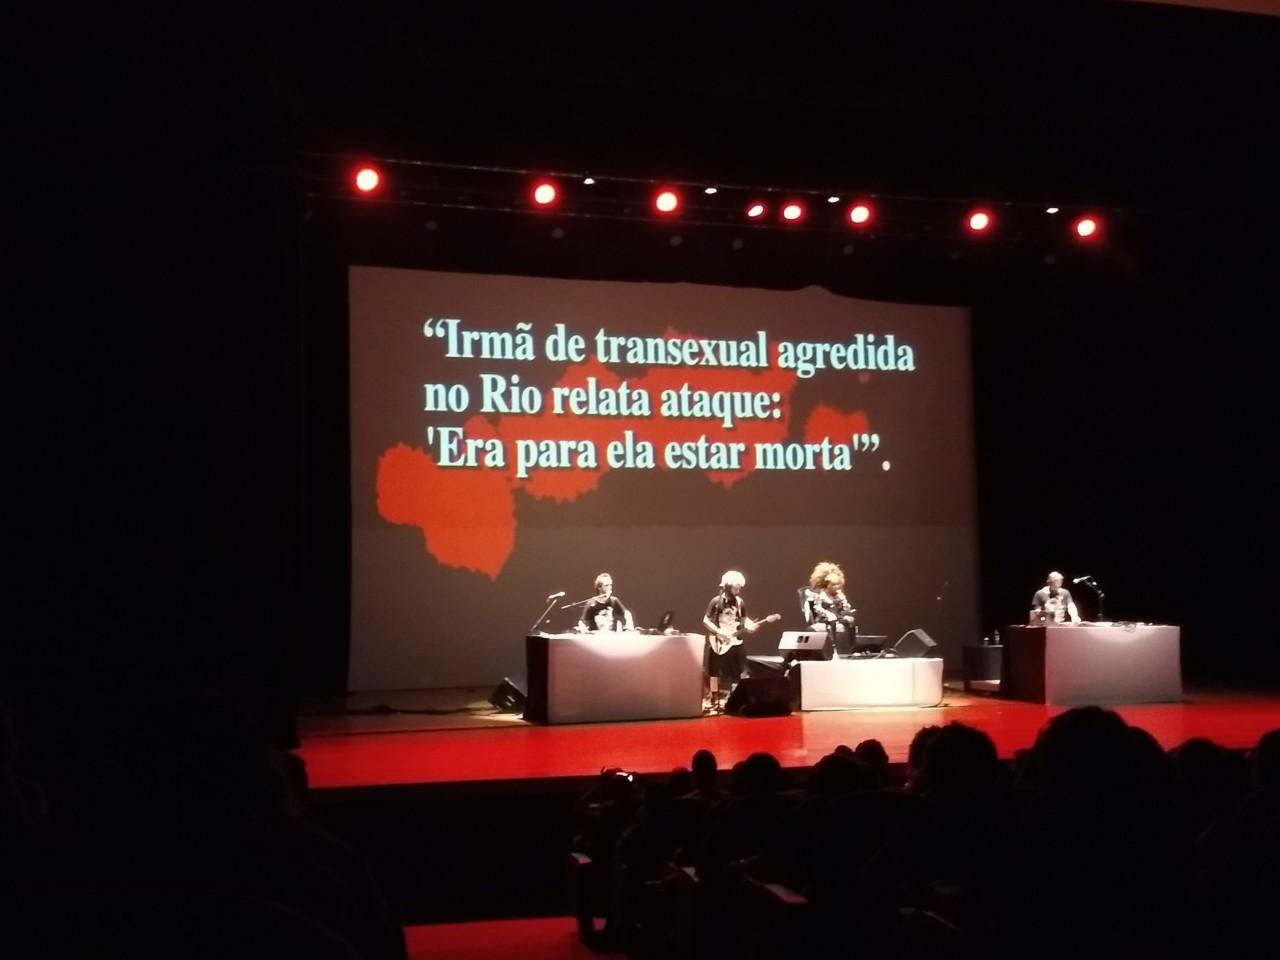 IMG 20180512 222622428 - ELZA SOARES: 'A Voz e a Máquina' contra a homofobia e os crimes de ódio